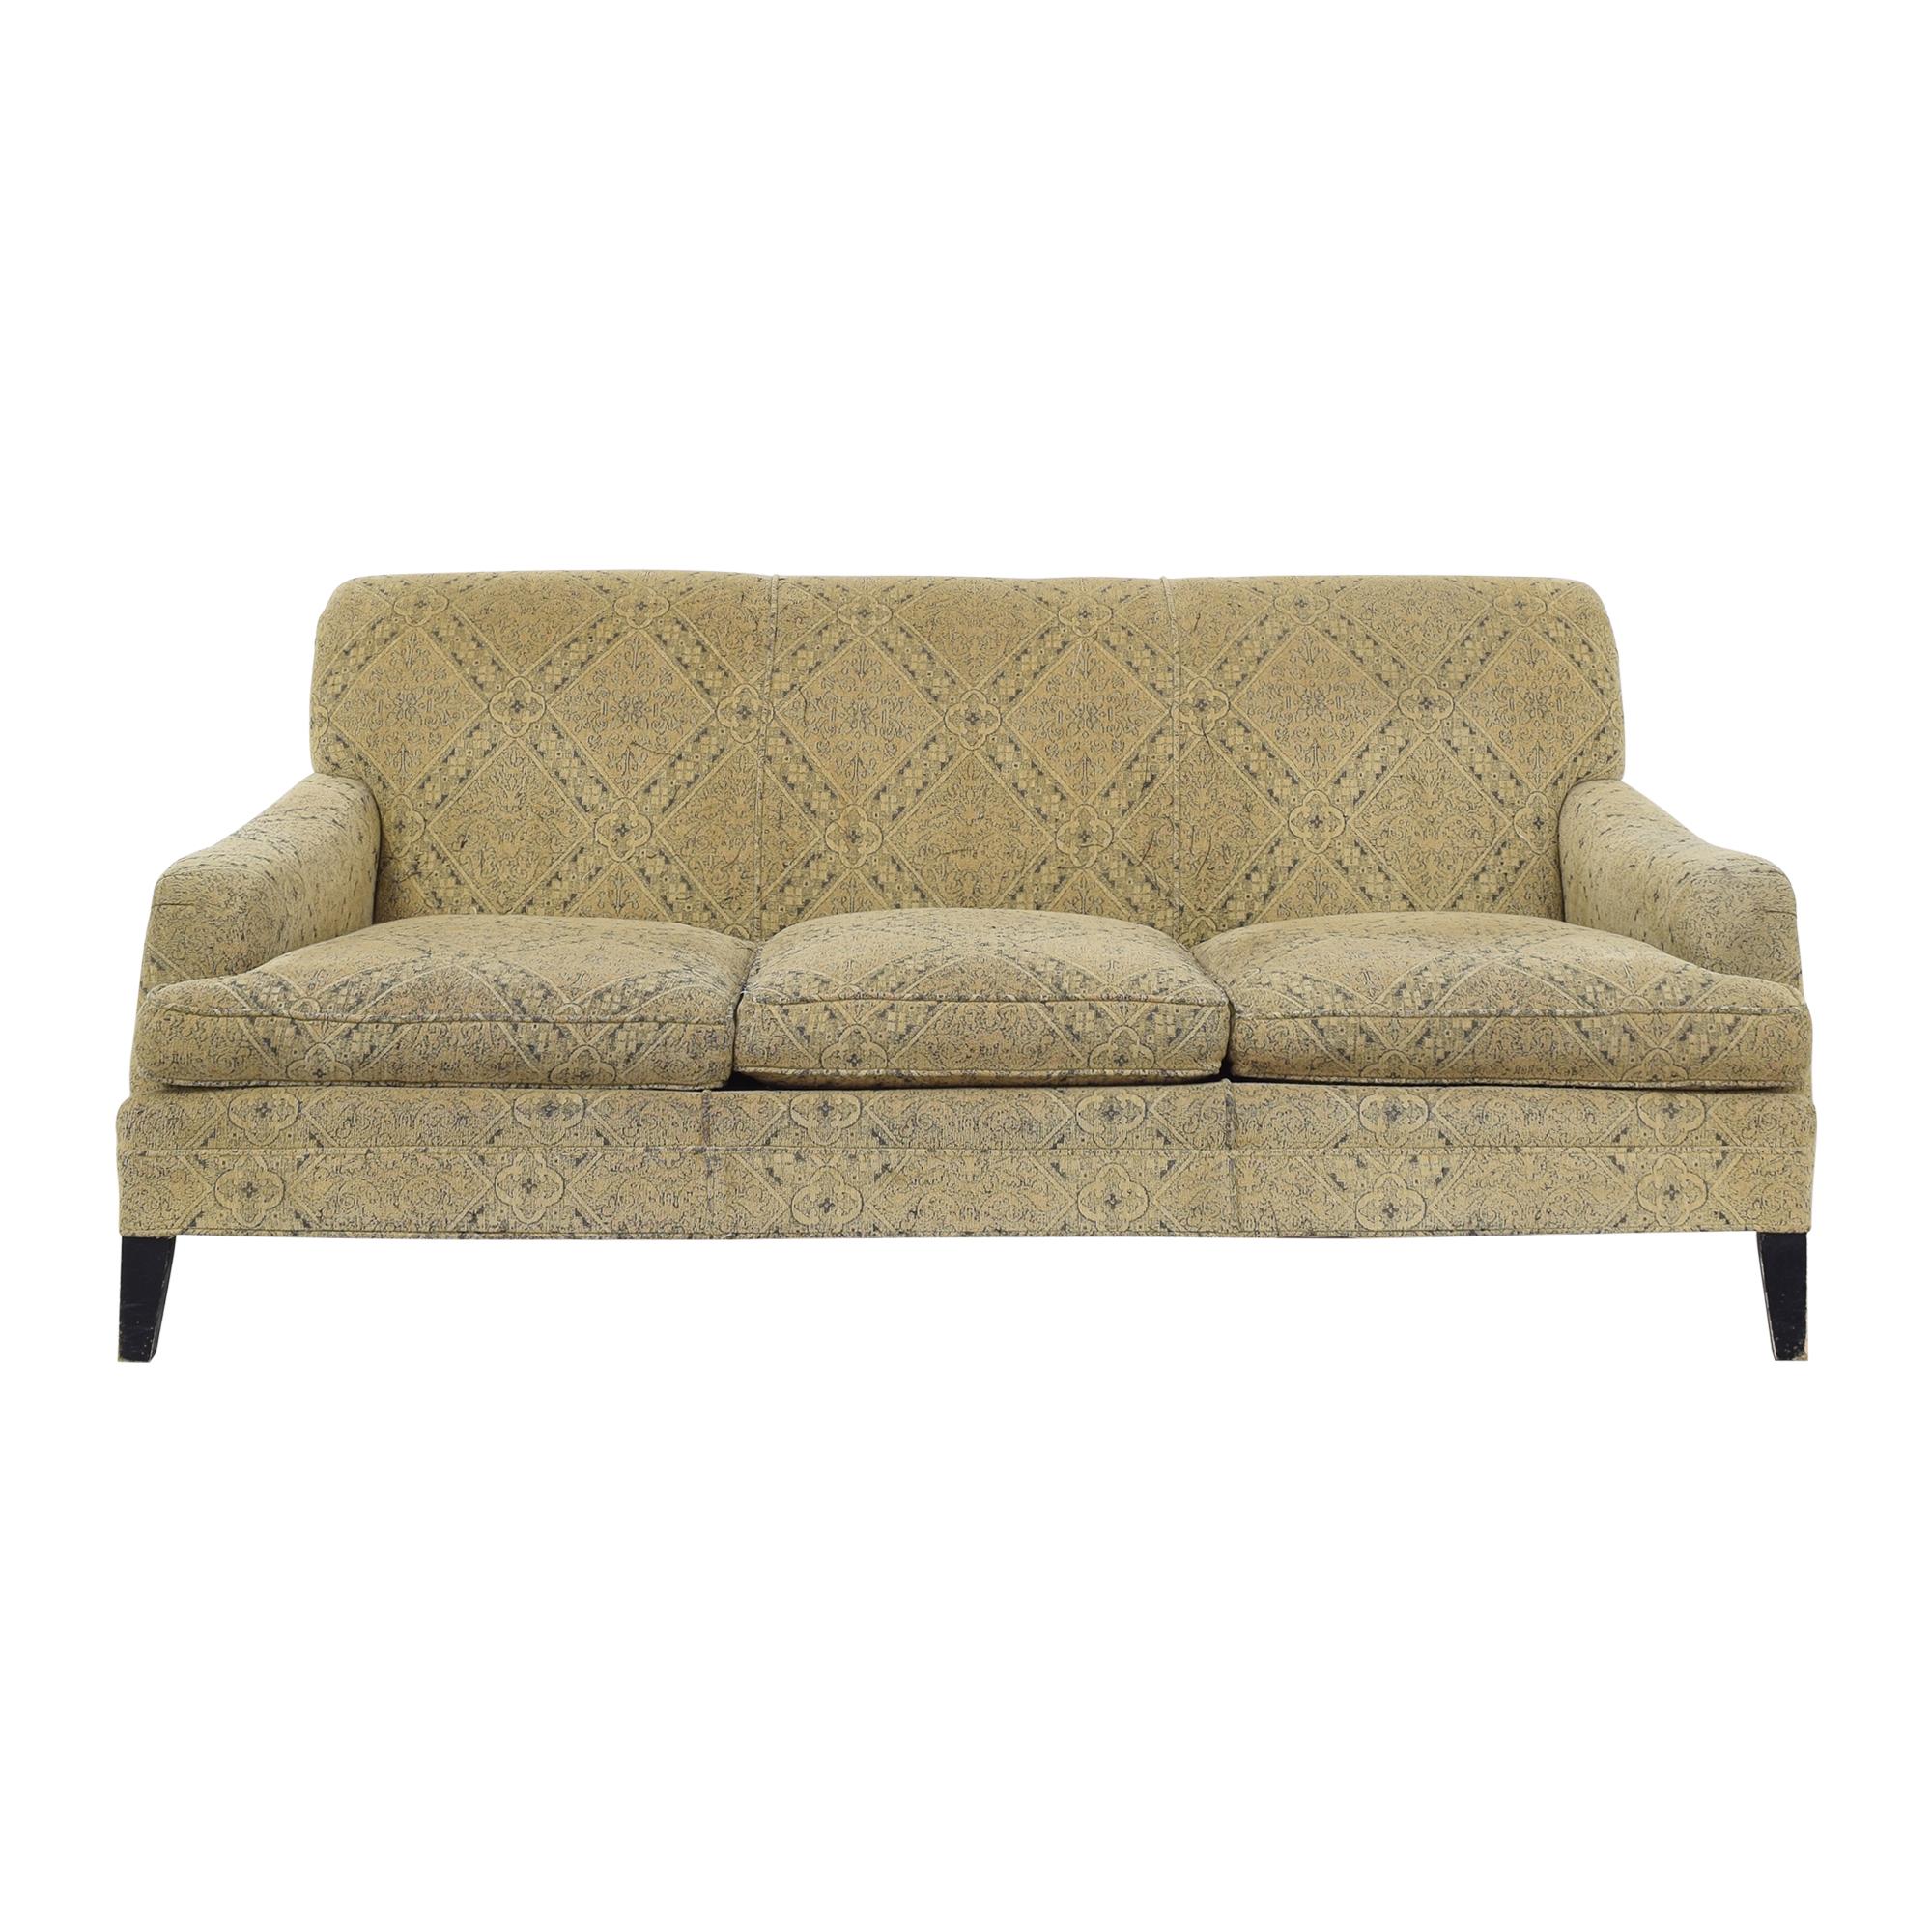 Mitchell Gold + Bob Williams Mitchell Gold + Bob Williams Three Cushion Sofa discount